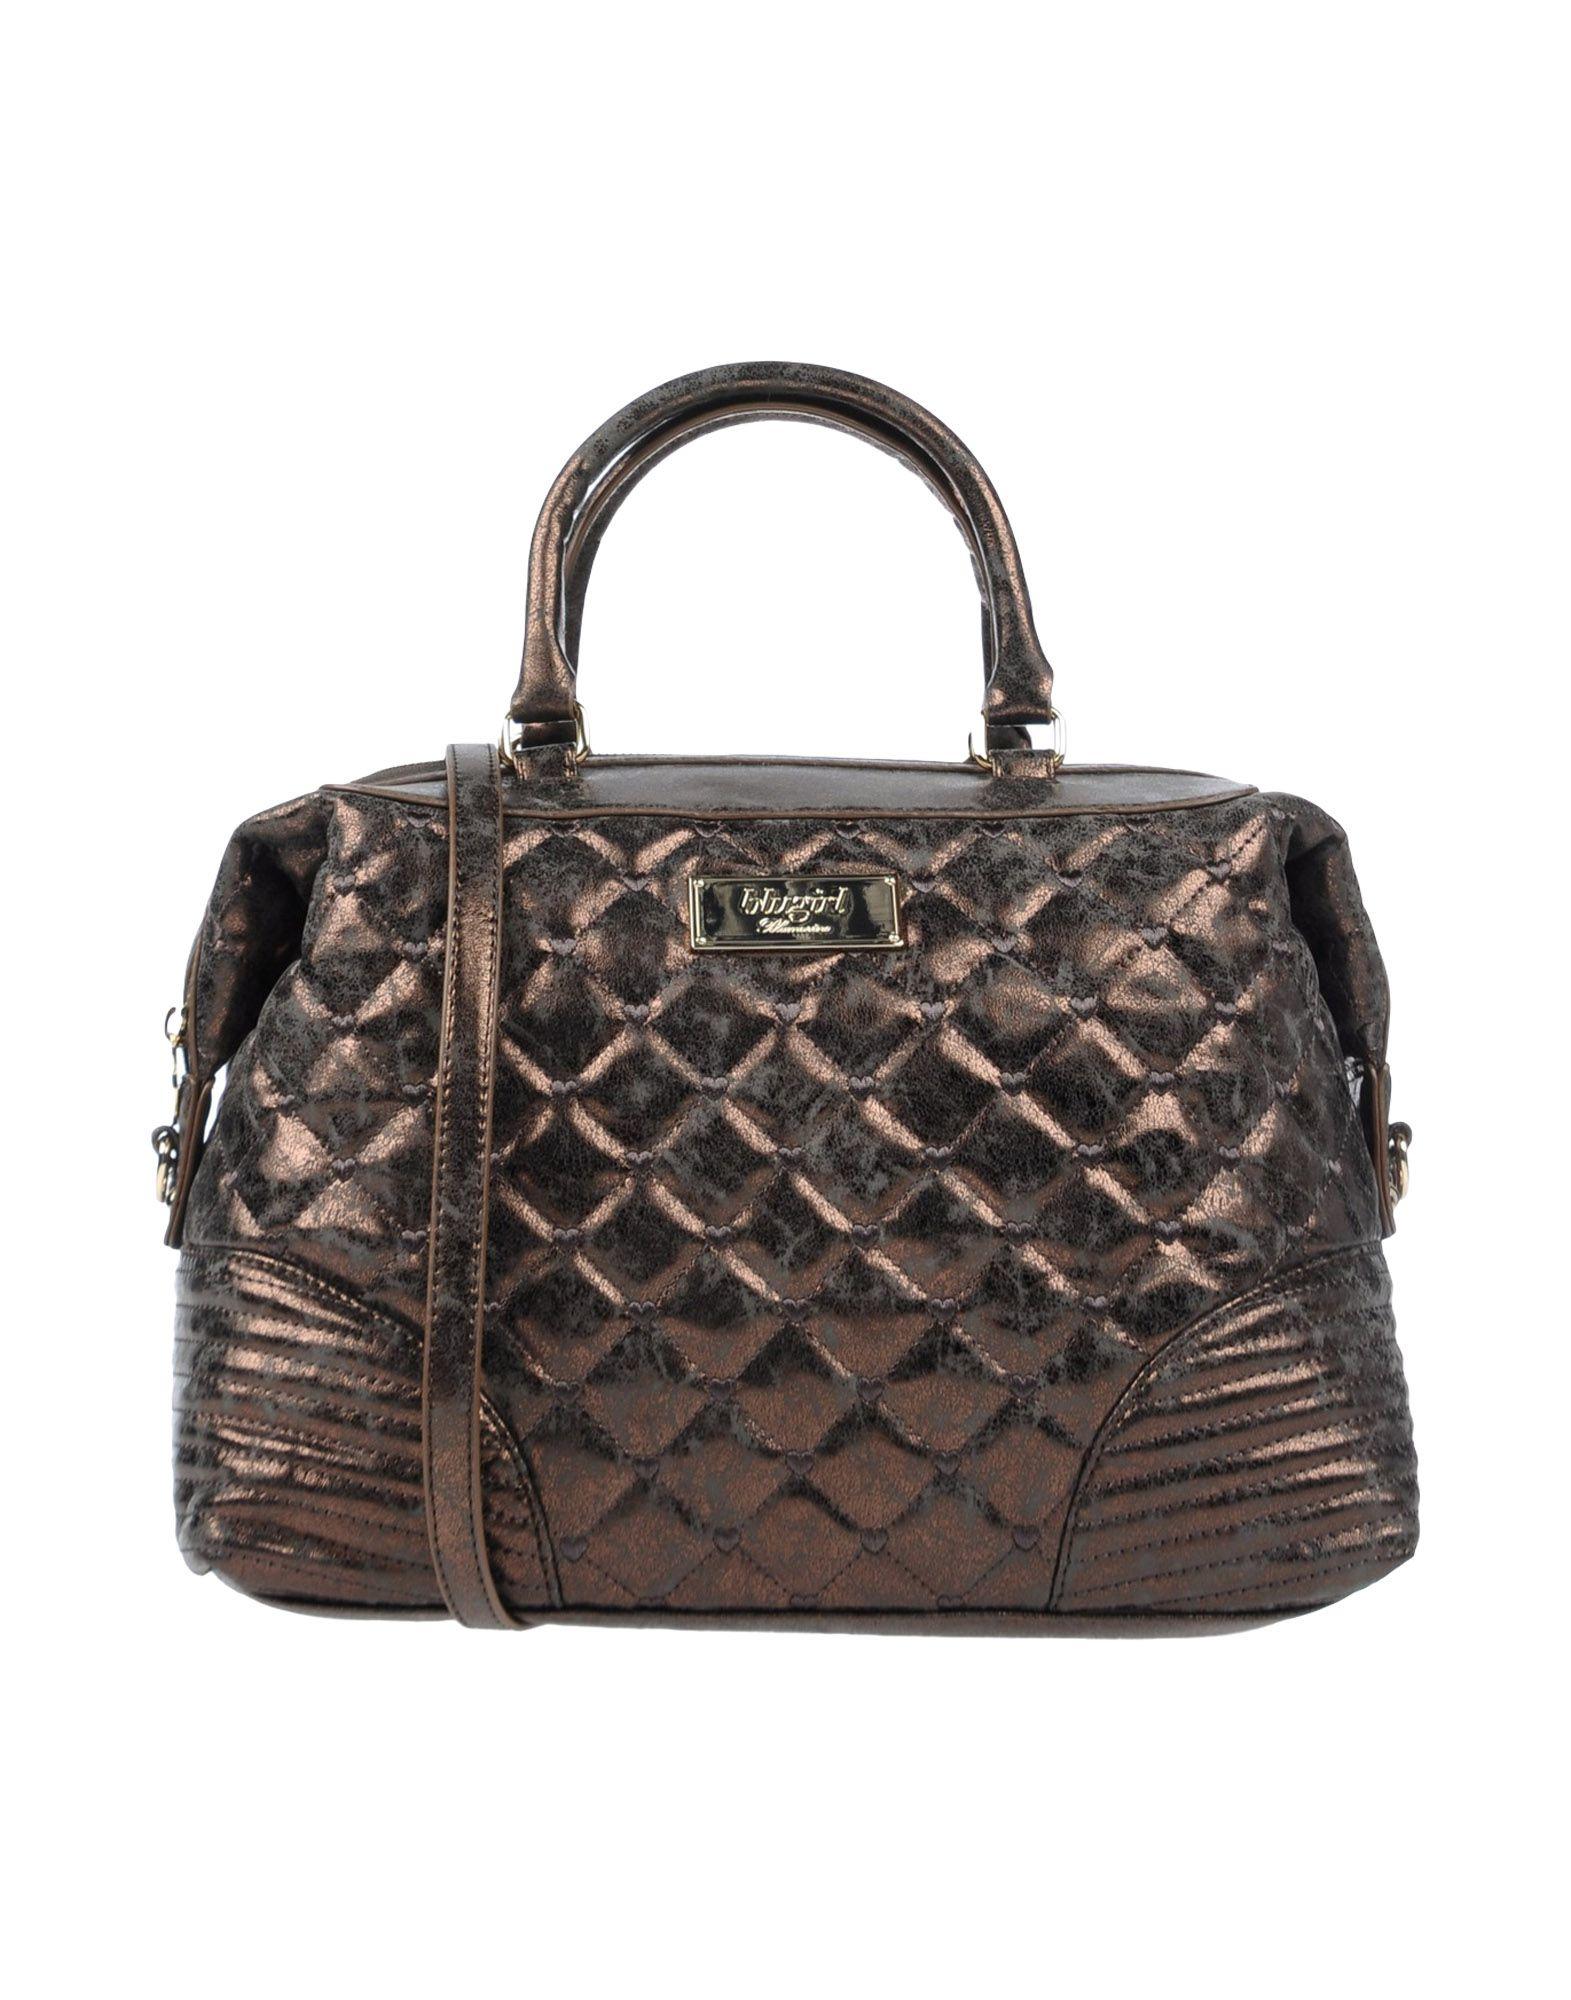 Blugirl blumarine Handbag in Brown (Dark brown)